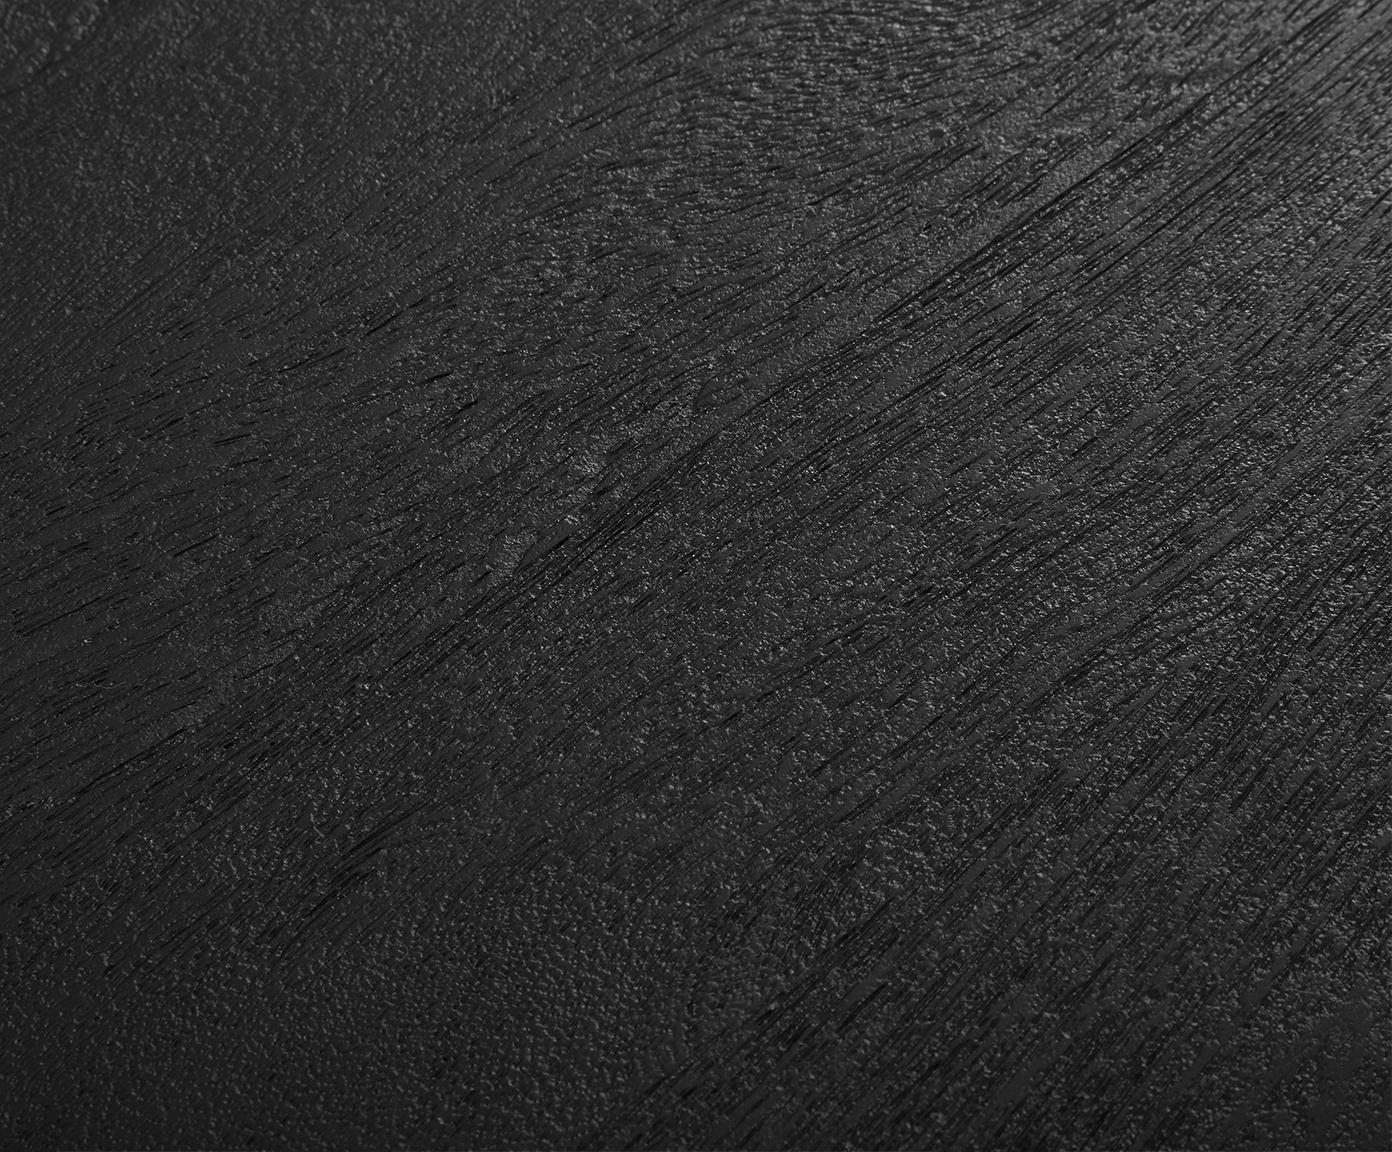 Eettafel Luca met massief houten tafelblad, Tafelblad: geborsteld en gelakt mass, Frame: gepoedercoat metaal, Tafelblad: zwart gelakt mangohout. Frame: mat zwart, B 240 x D 100 cm